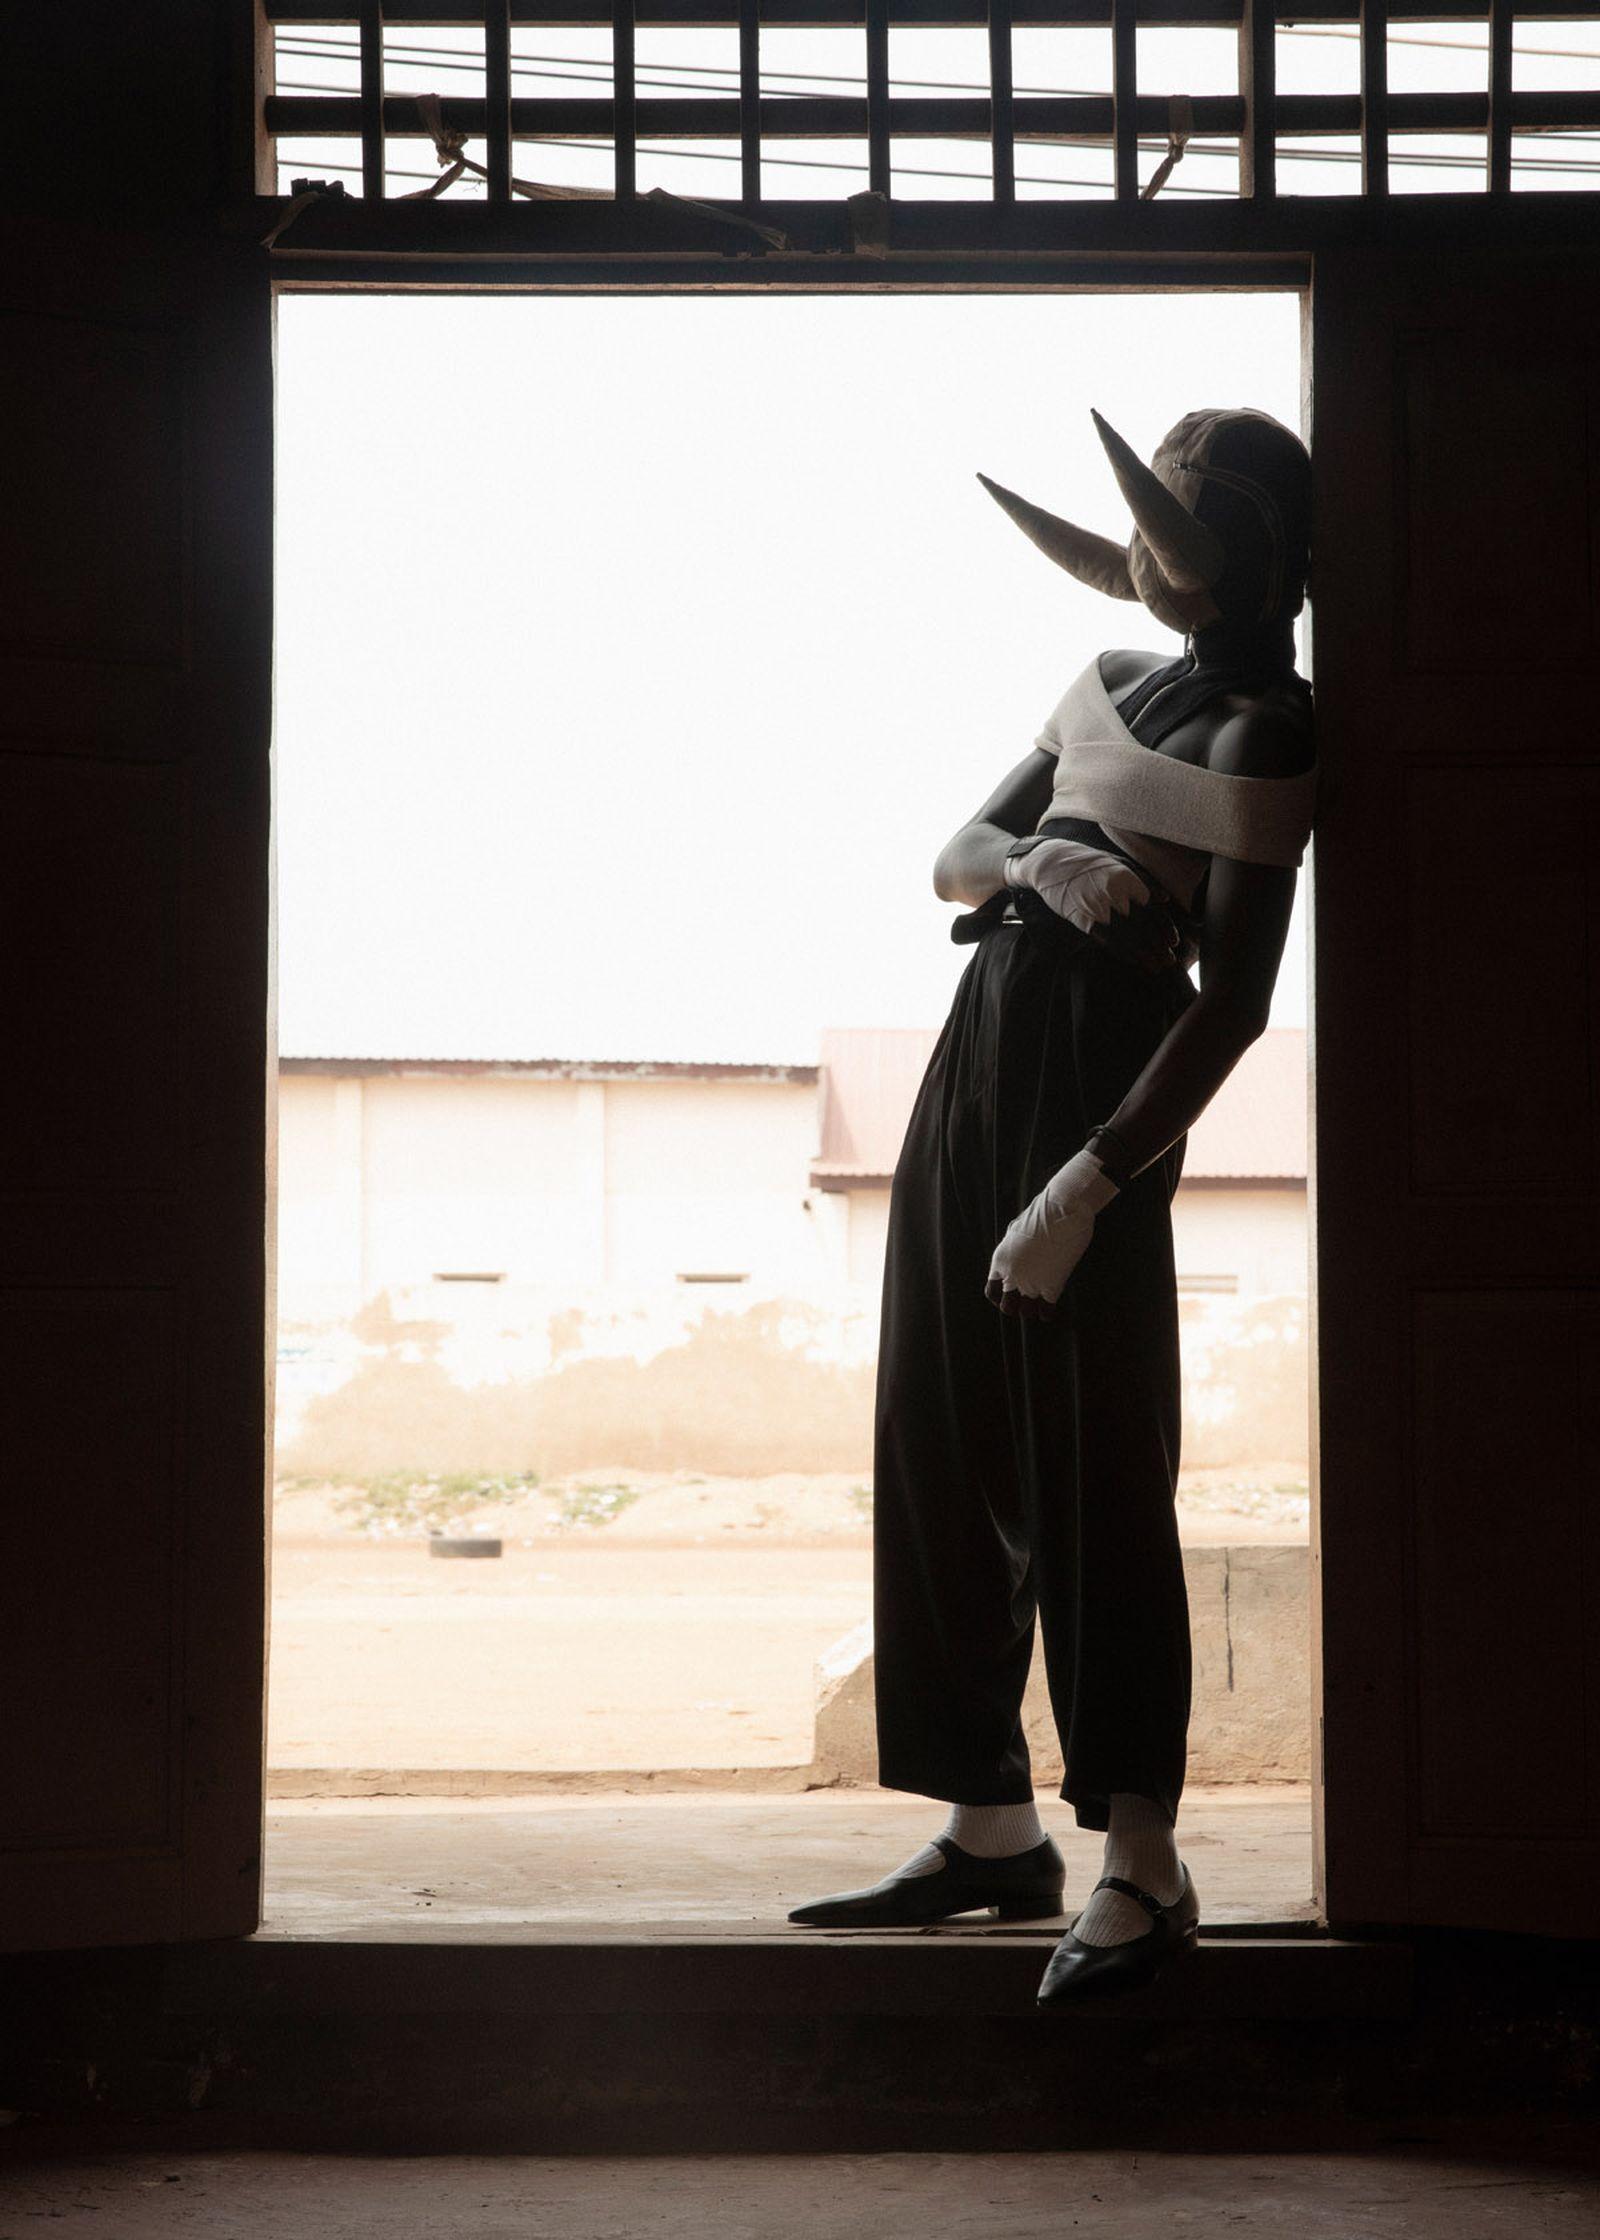 KWABENA Top and belt GMBH Pants YOHJI YAMAMOTO Socks CELINE Shoes MAISON MARGIELA